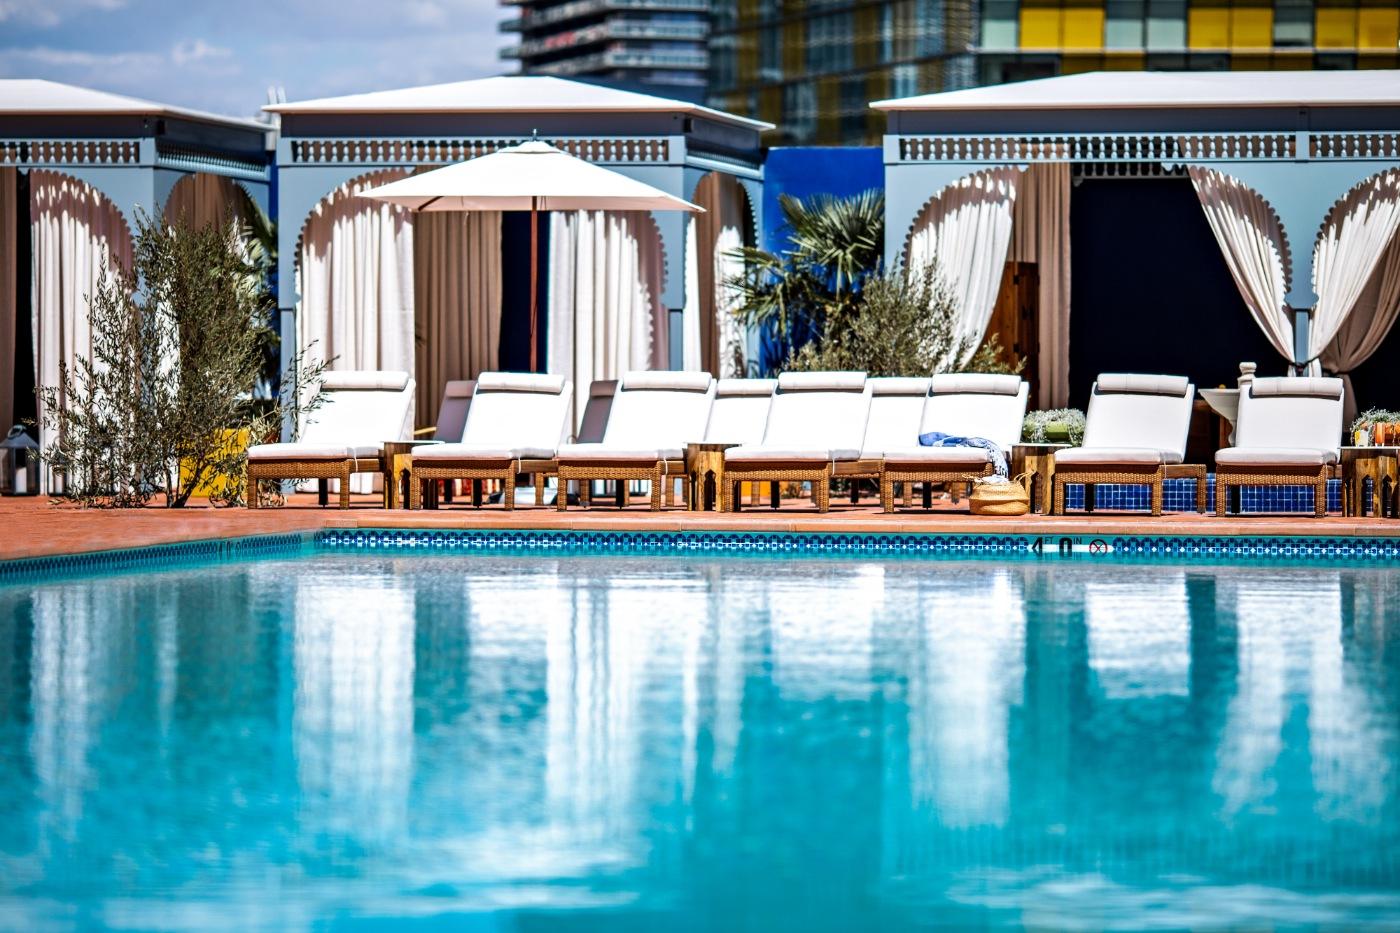 Nomad Pool And Party Soon To Splash Onto Las Vegas Strip